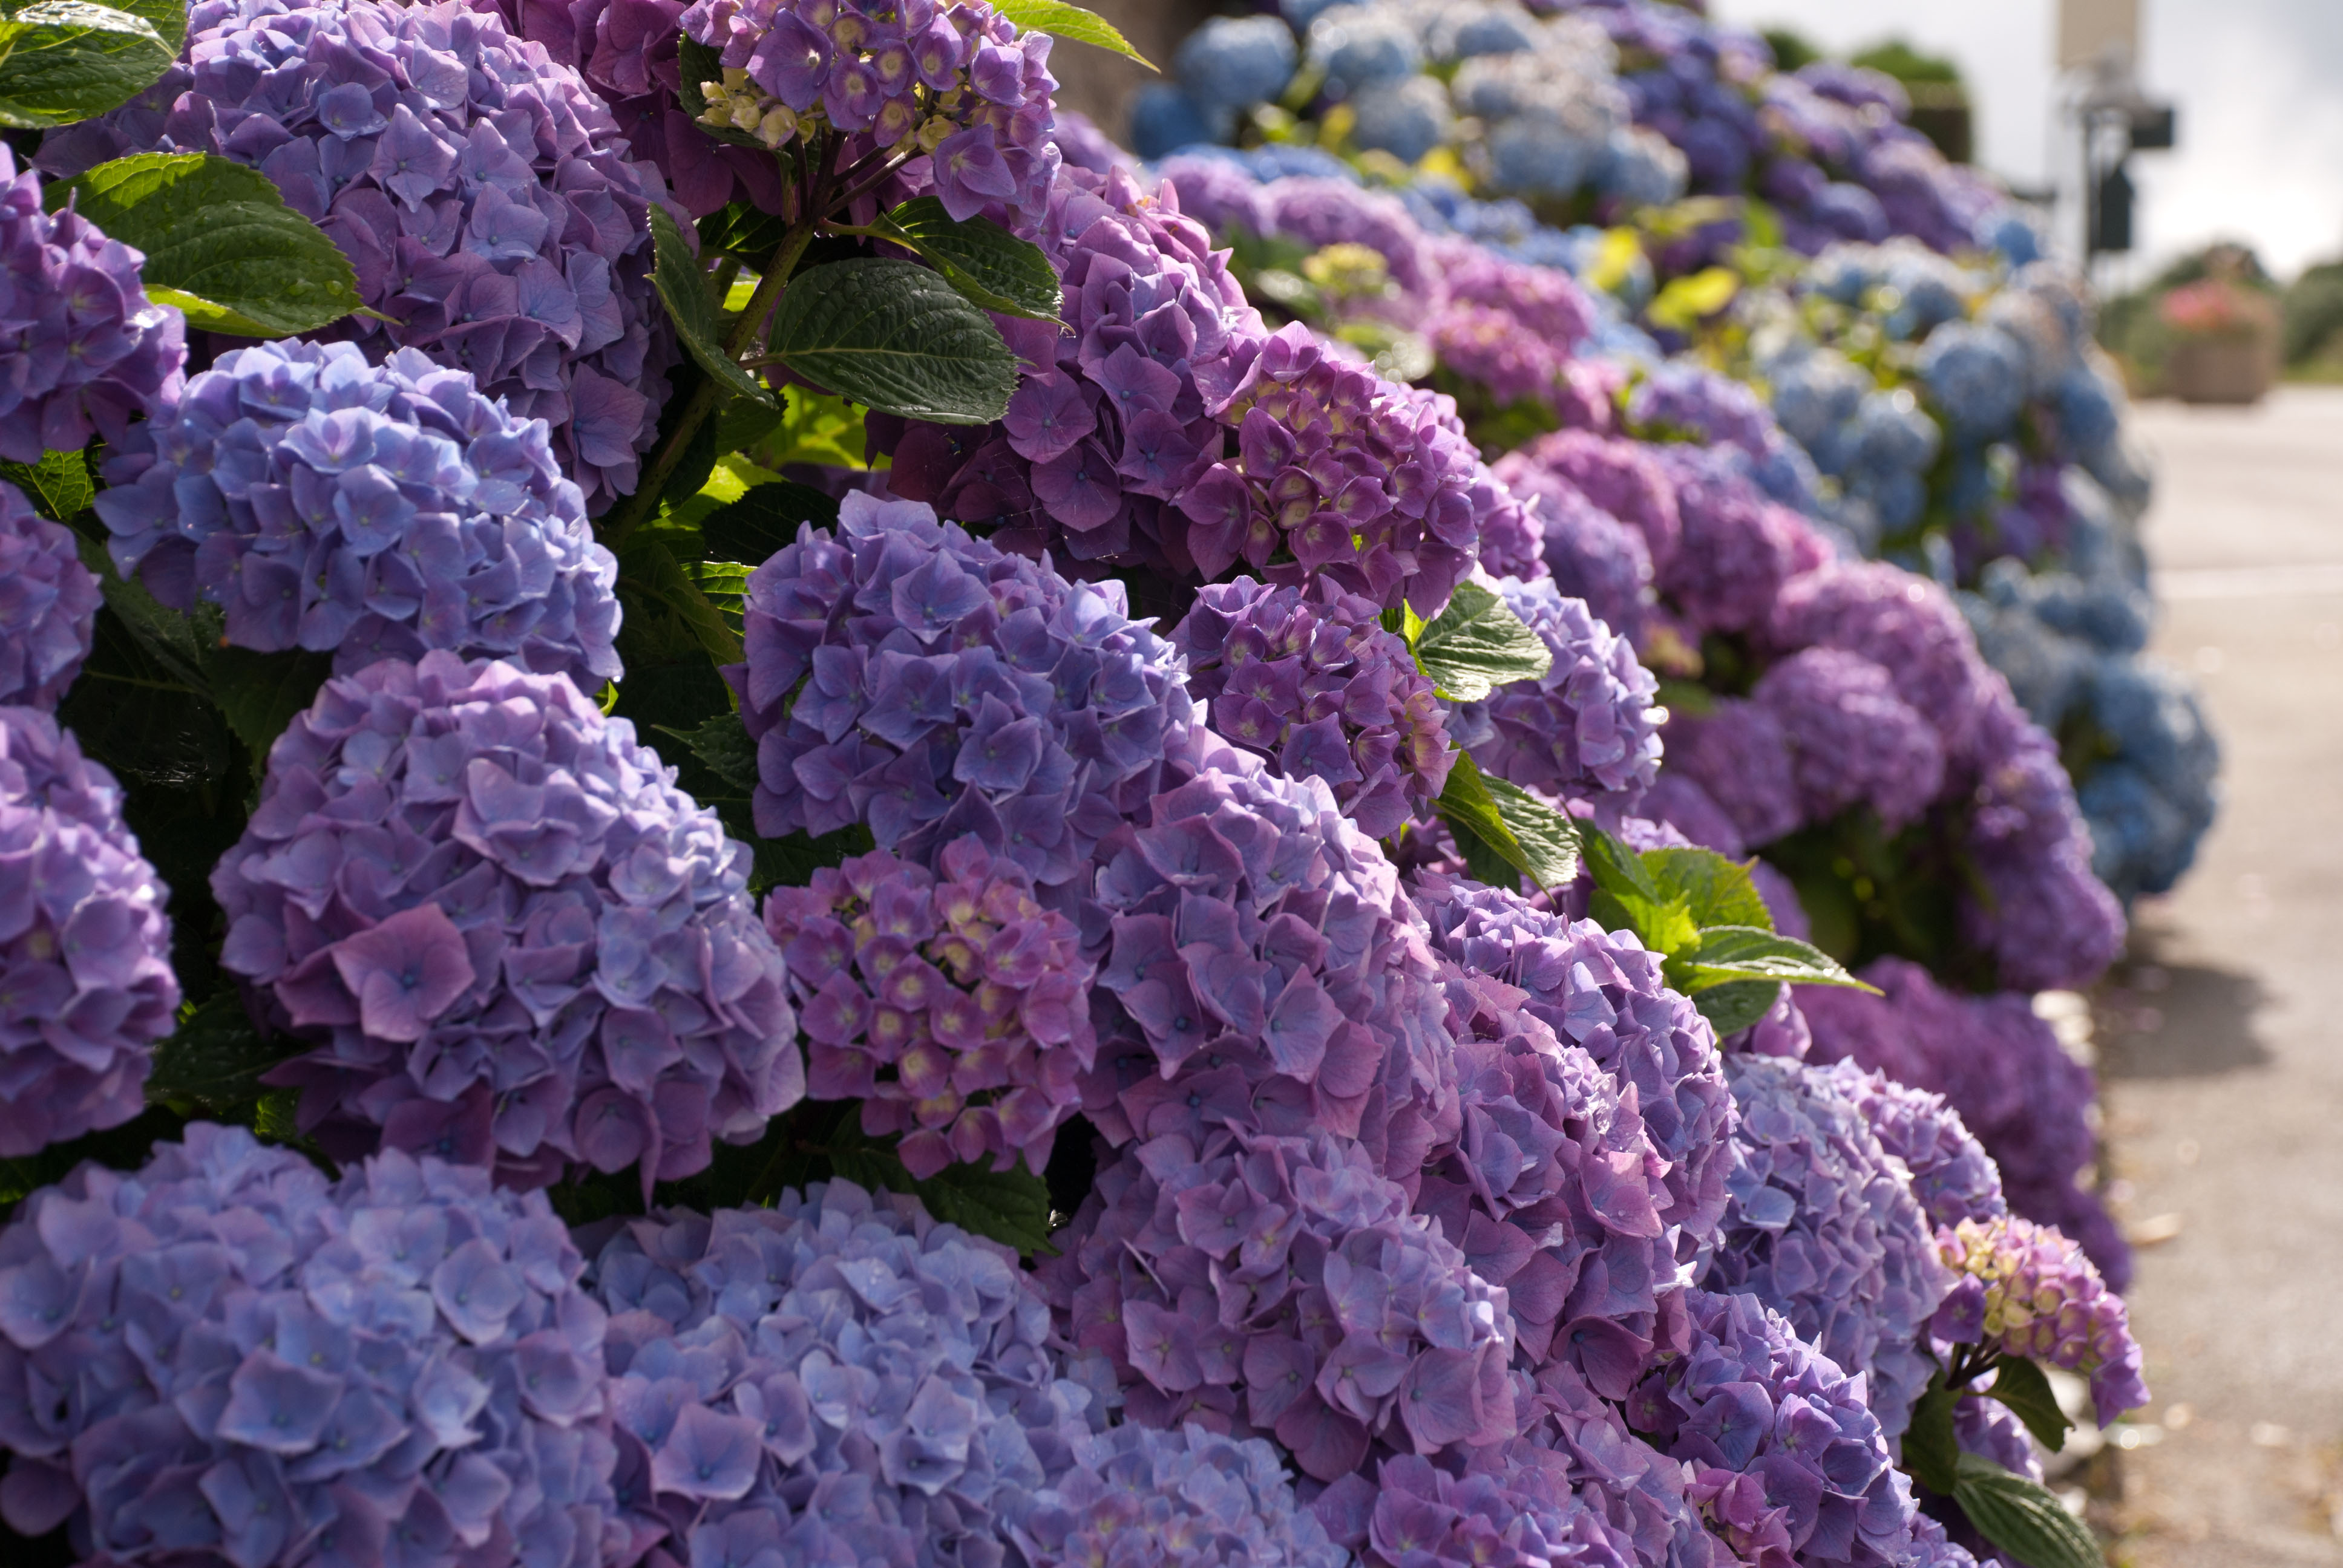 France in bloom magnificent blue hydrangeas lisa cox garden the izmirmasajfo Gallery